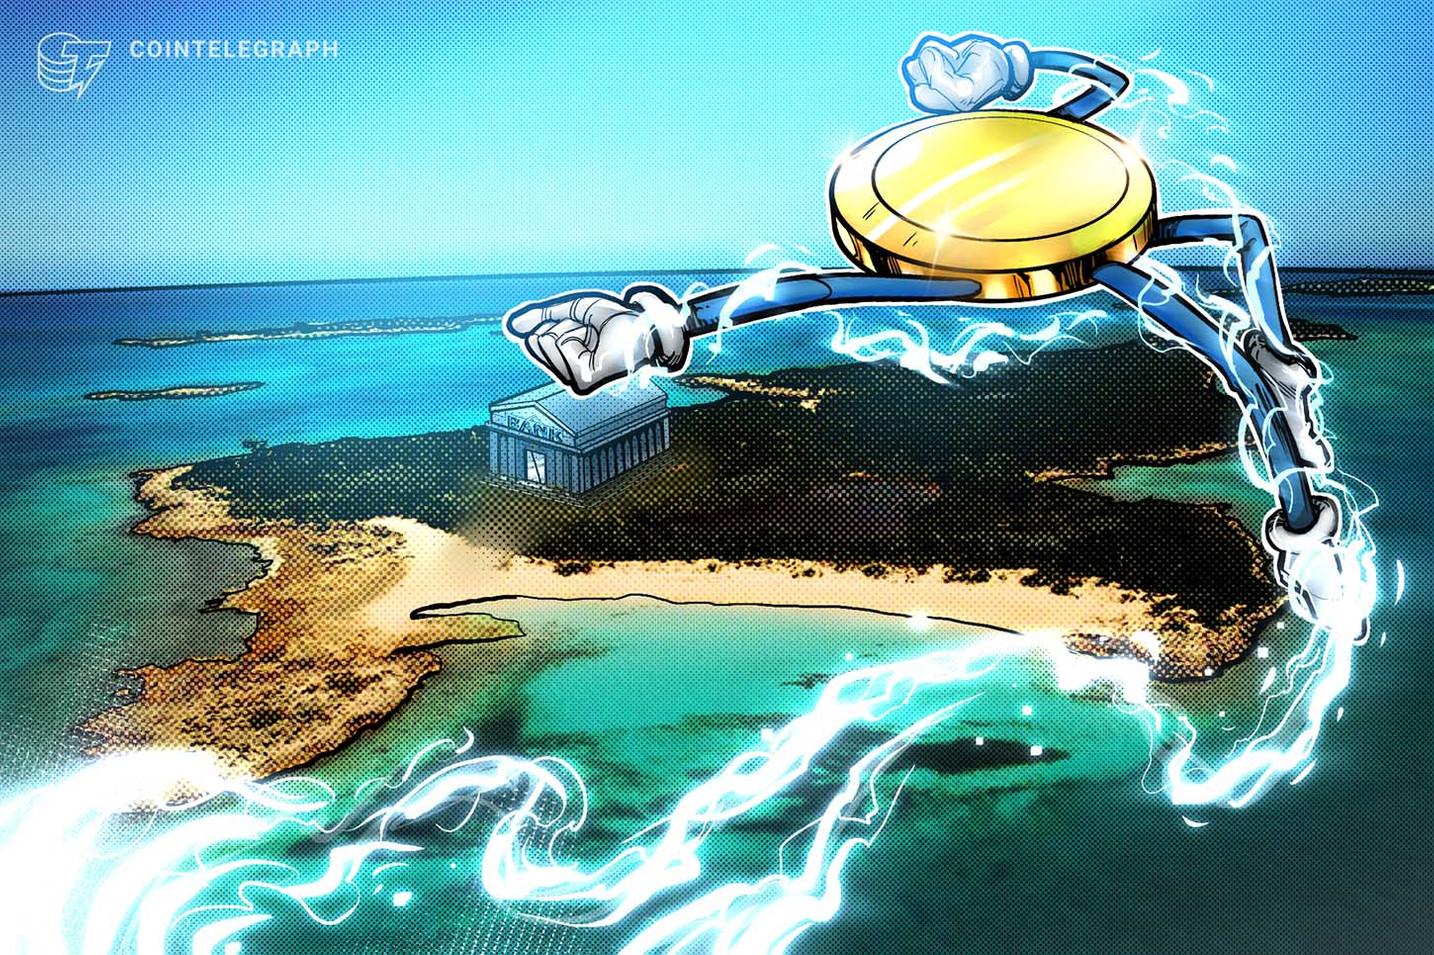 Bahamas central bank prepares national Sand Dollar push for summer